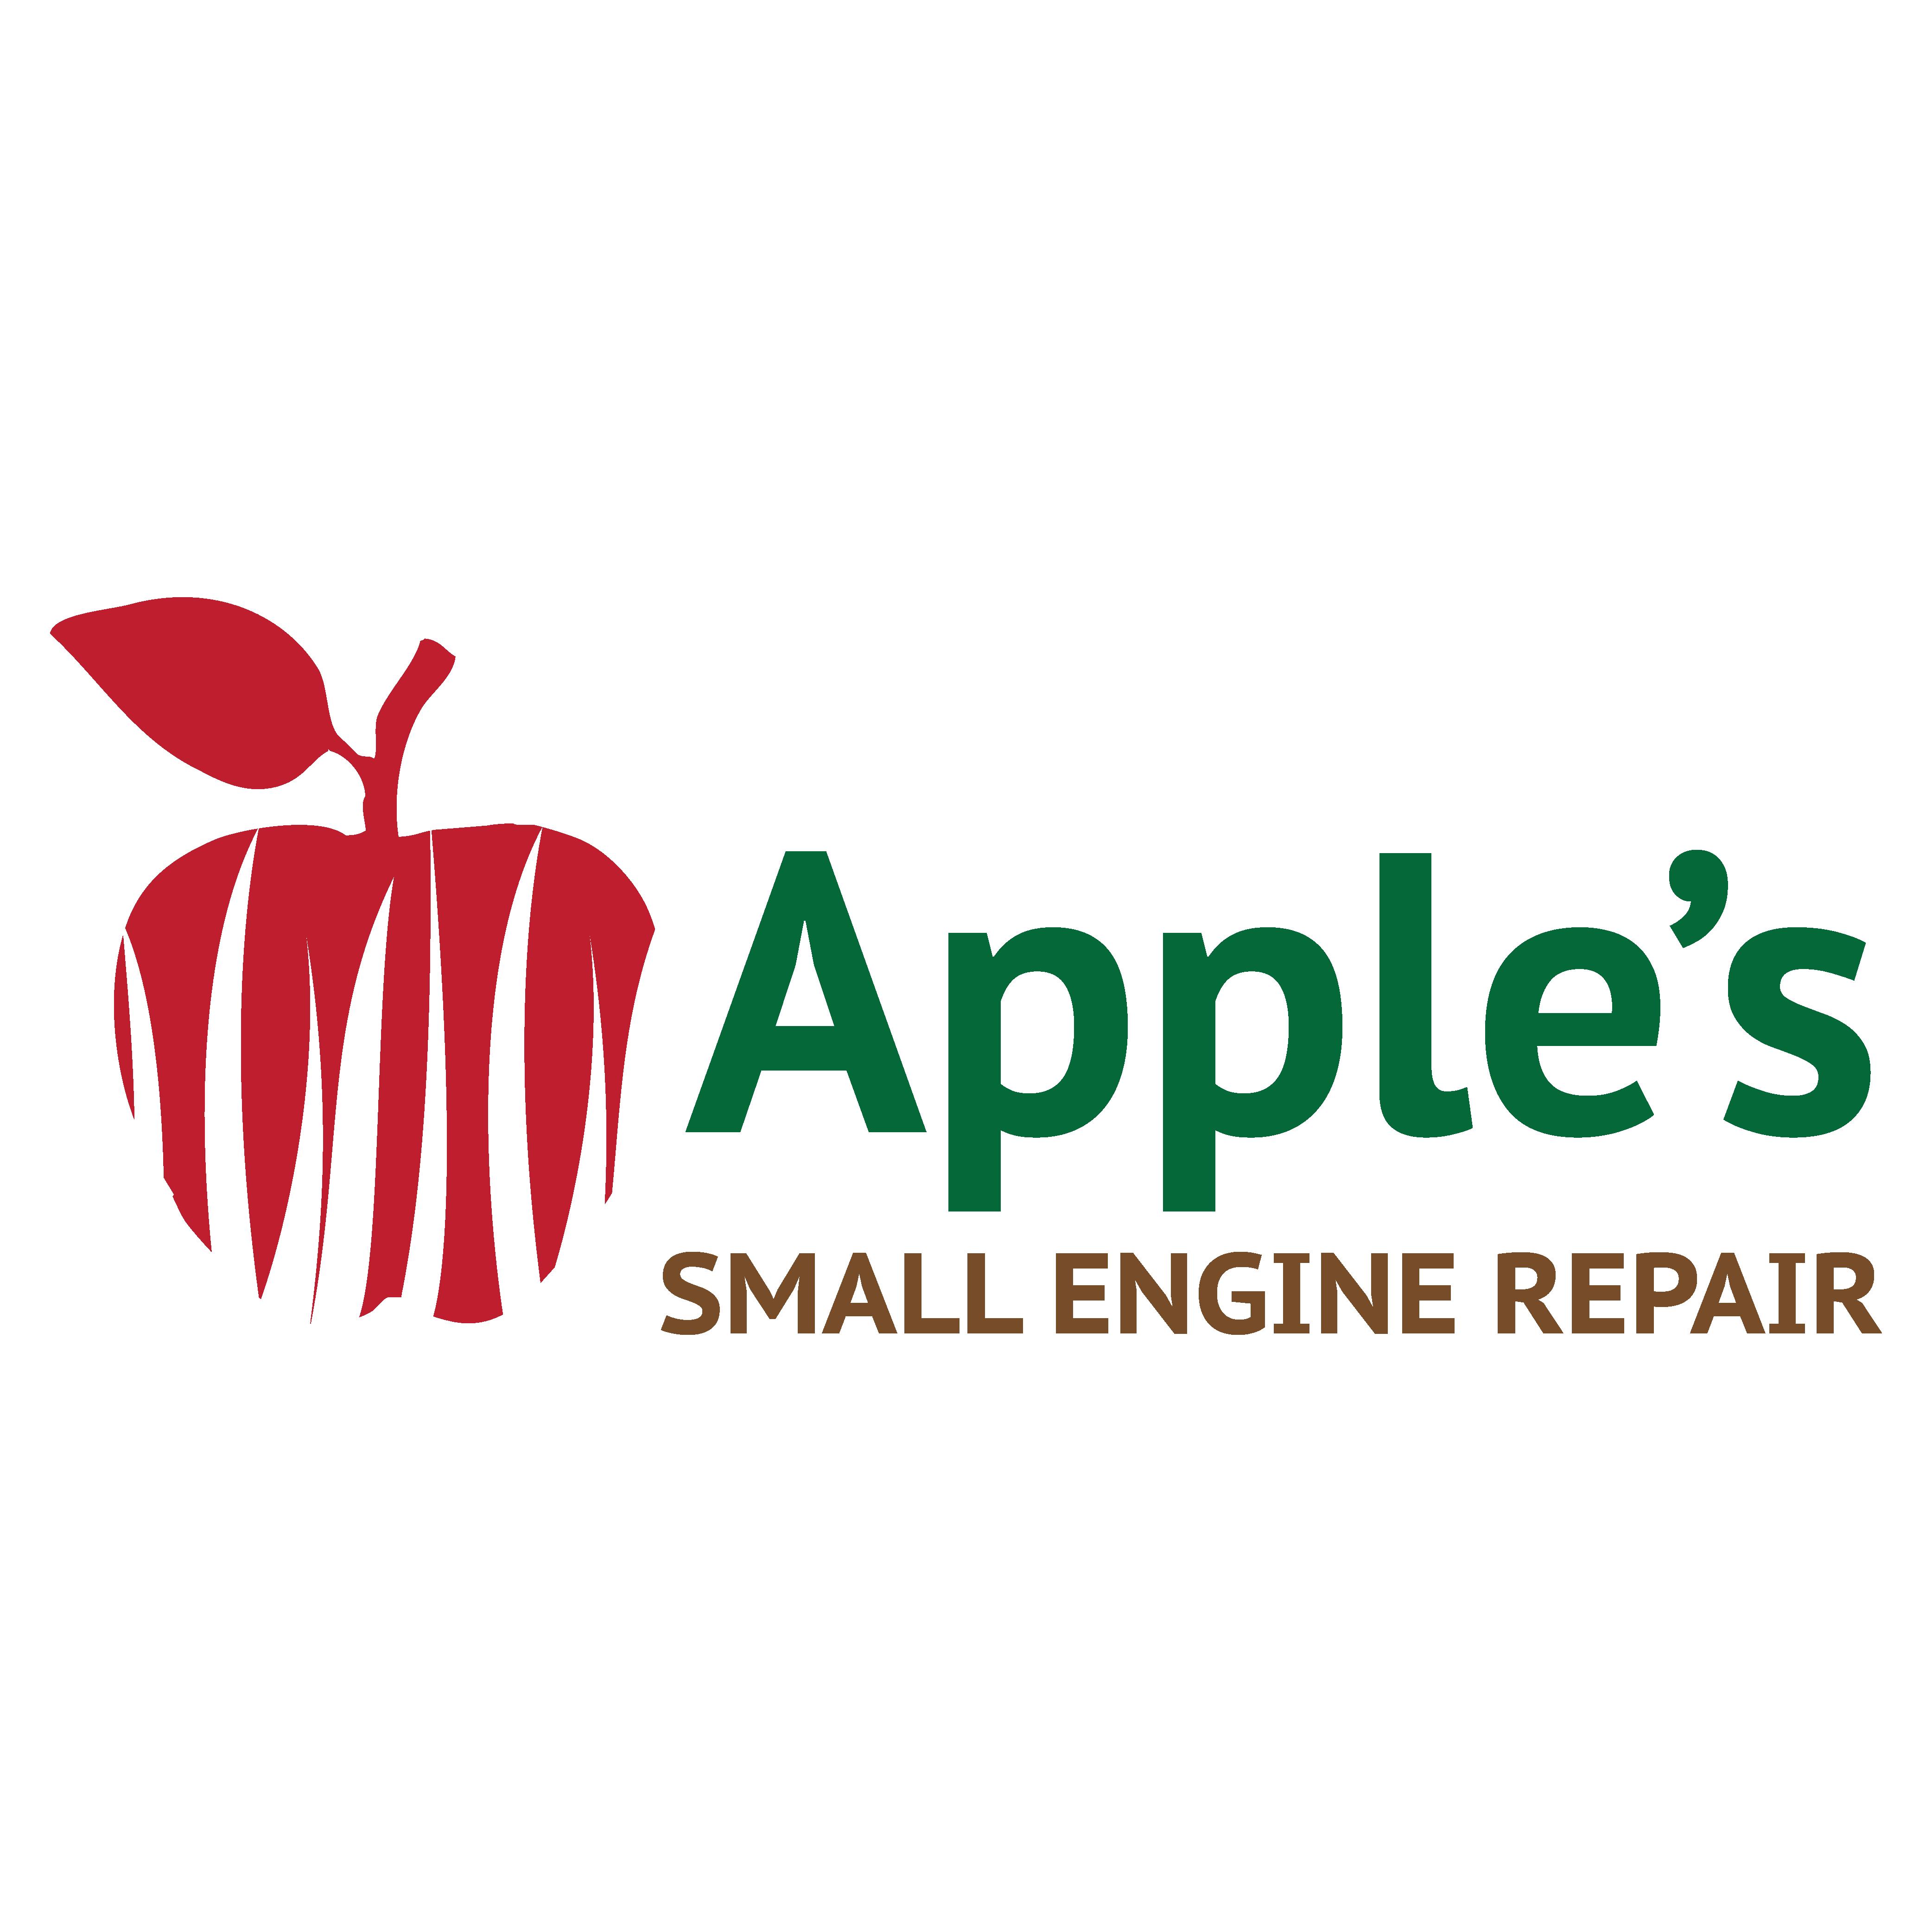 Apple's Small Engine Repair Logo